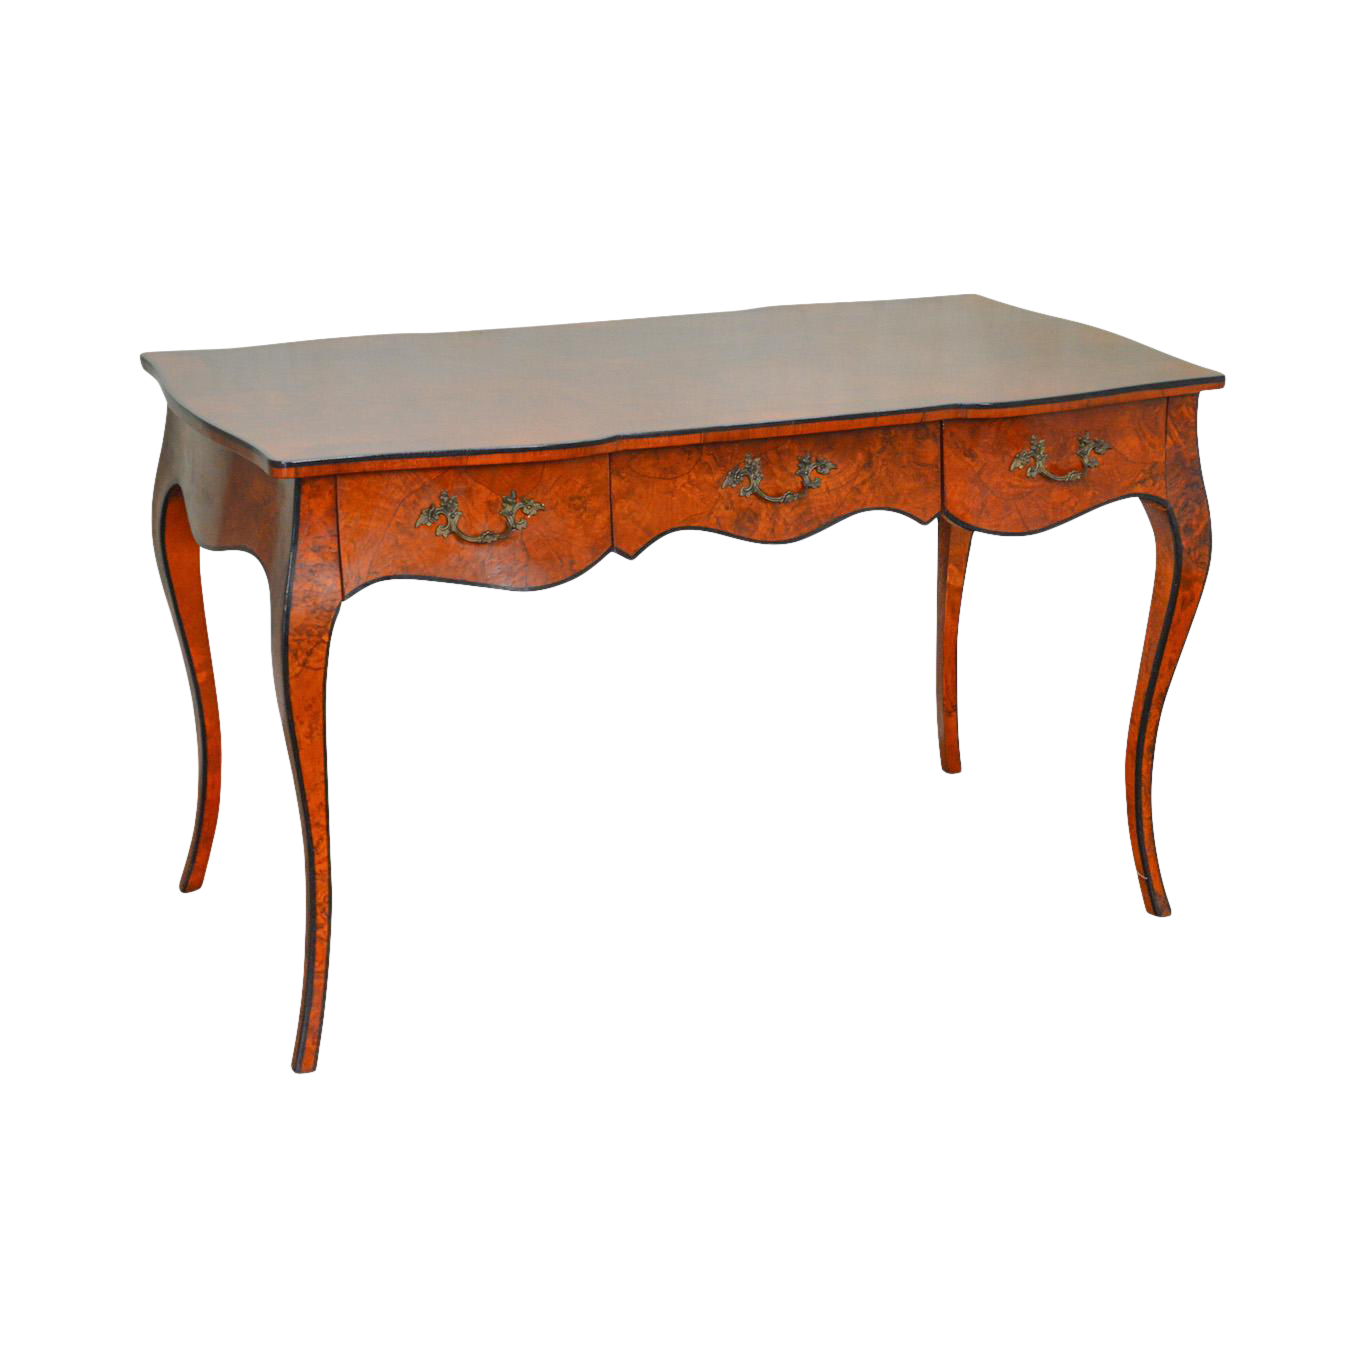 Lovely Italian Burl Wood Louis XV Style Writing Desk